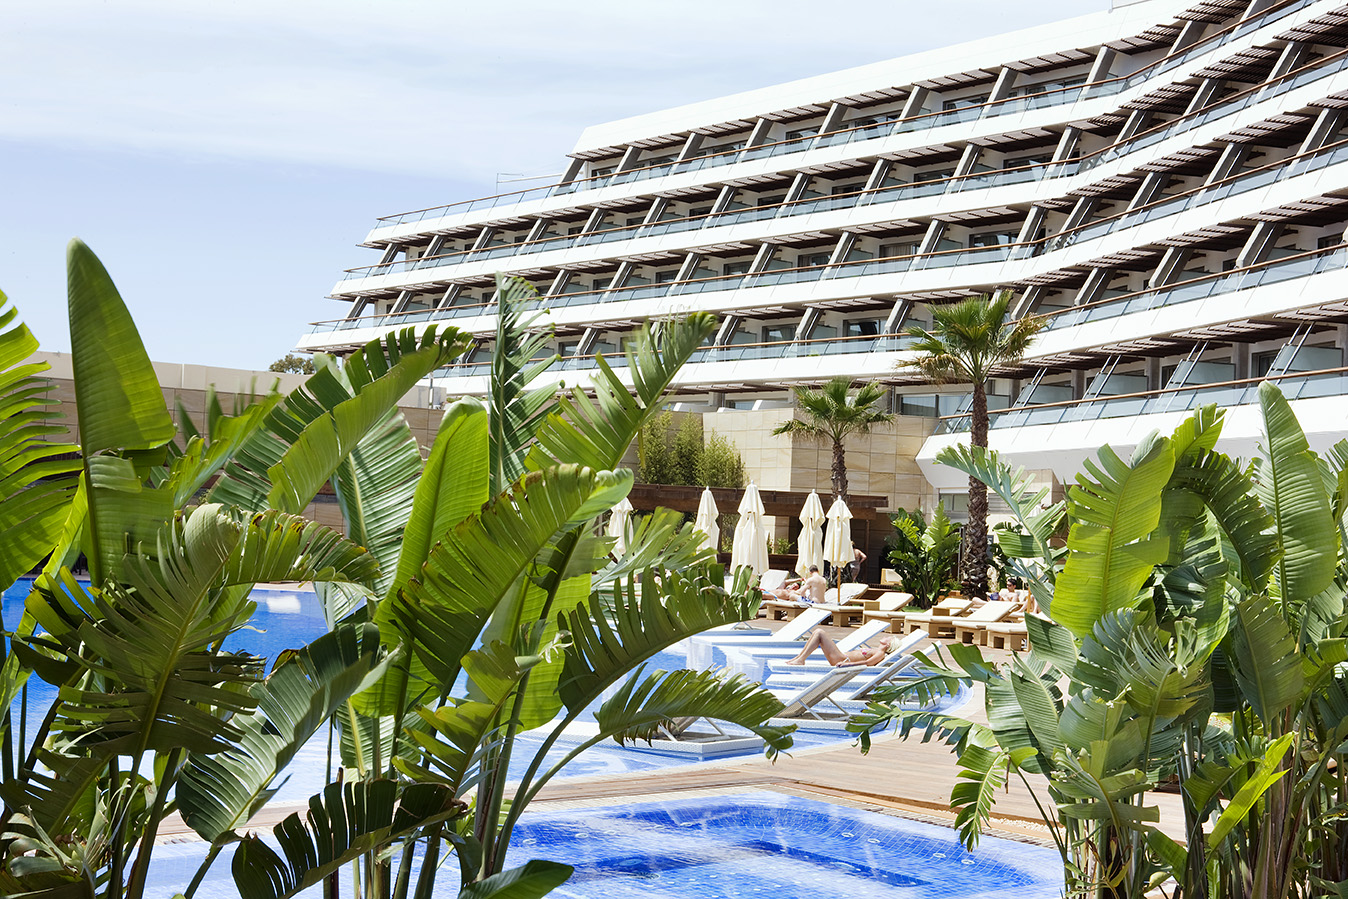 Ibiza gran hotel 5 luxury spa hotel taste ibiza for Ibiza hotel luxury 5 star